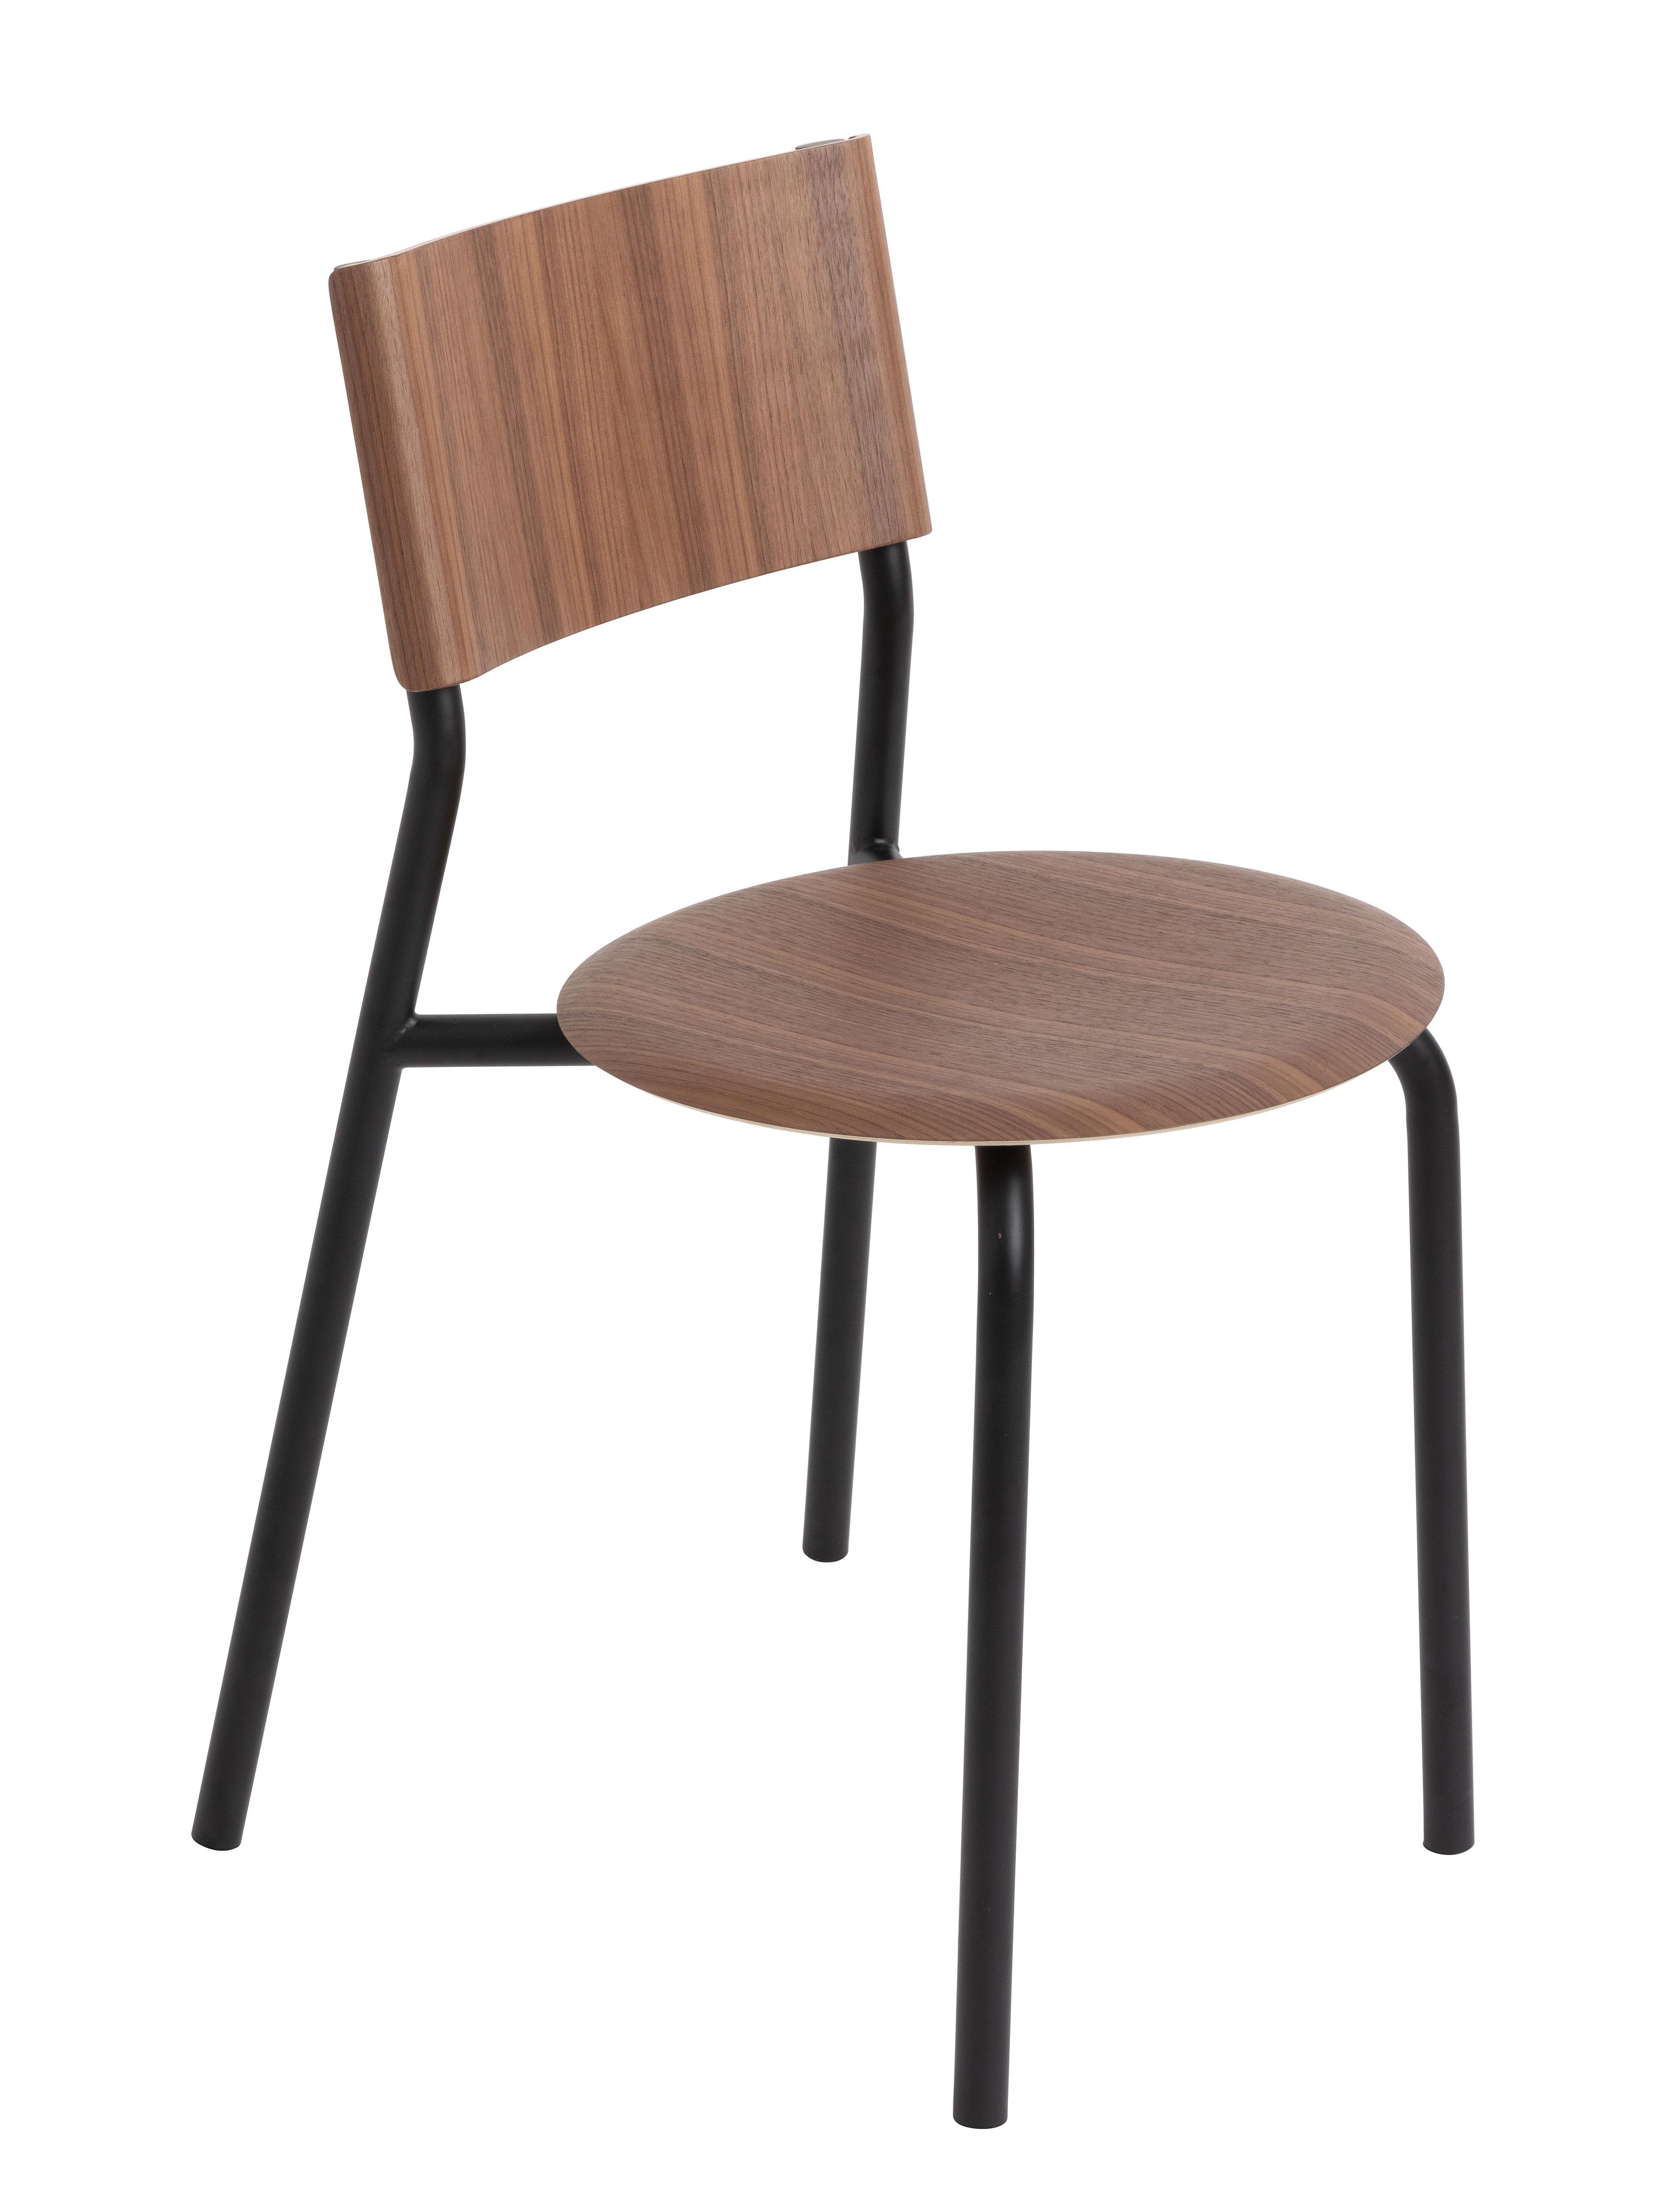 Furniture - Chairs - SSD Stacking chair - / Walnut by TipToe - Walnut / Graphite black - Powder coated steel, Walnut